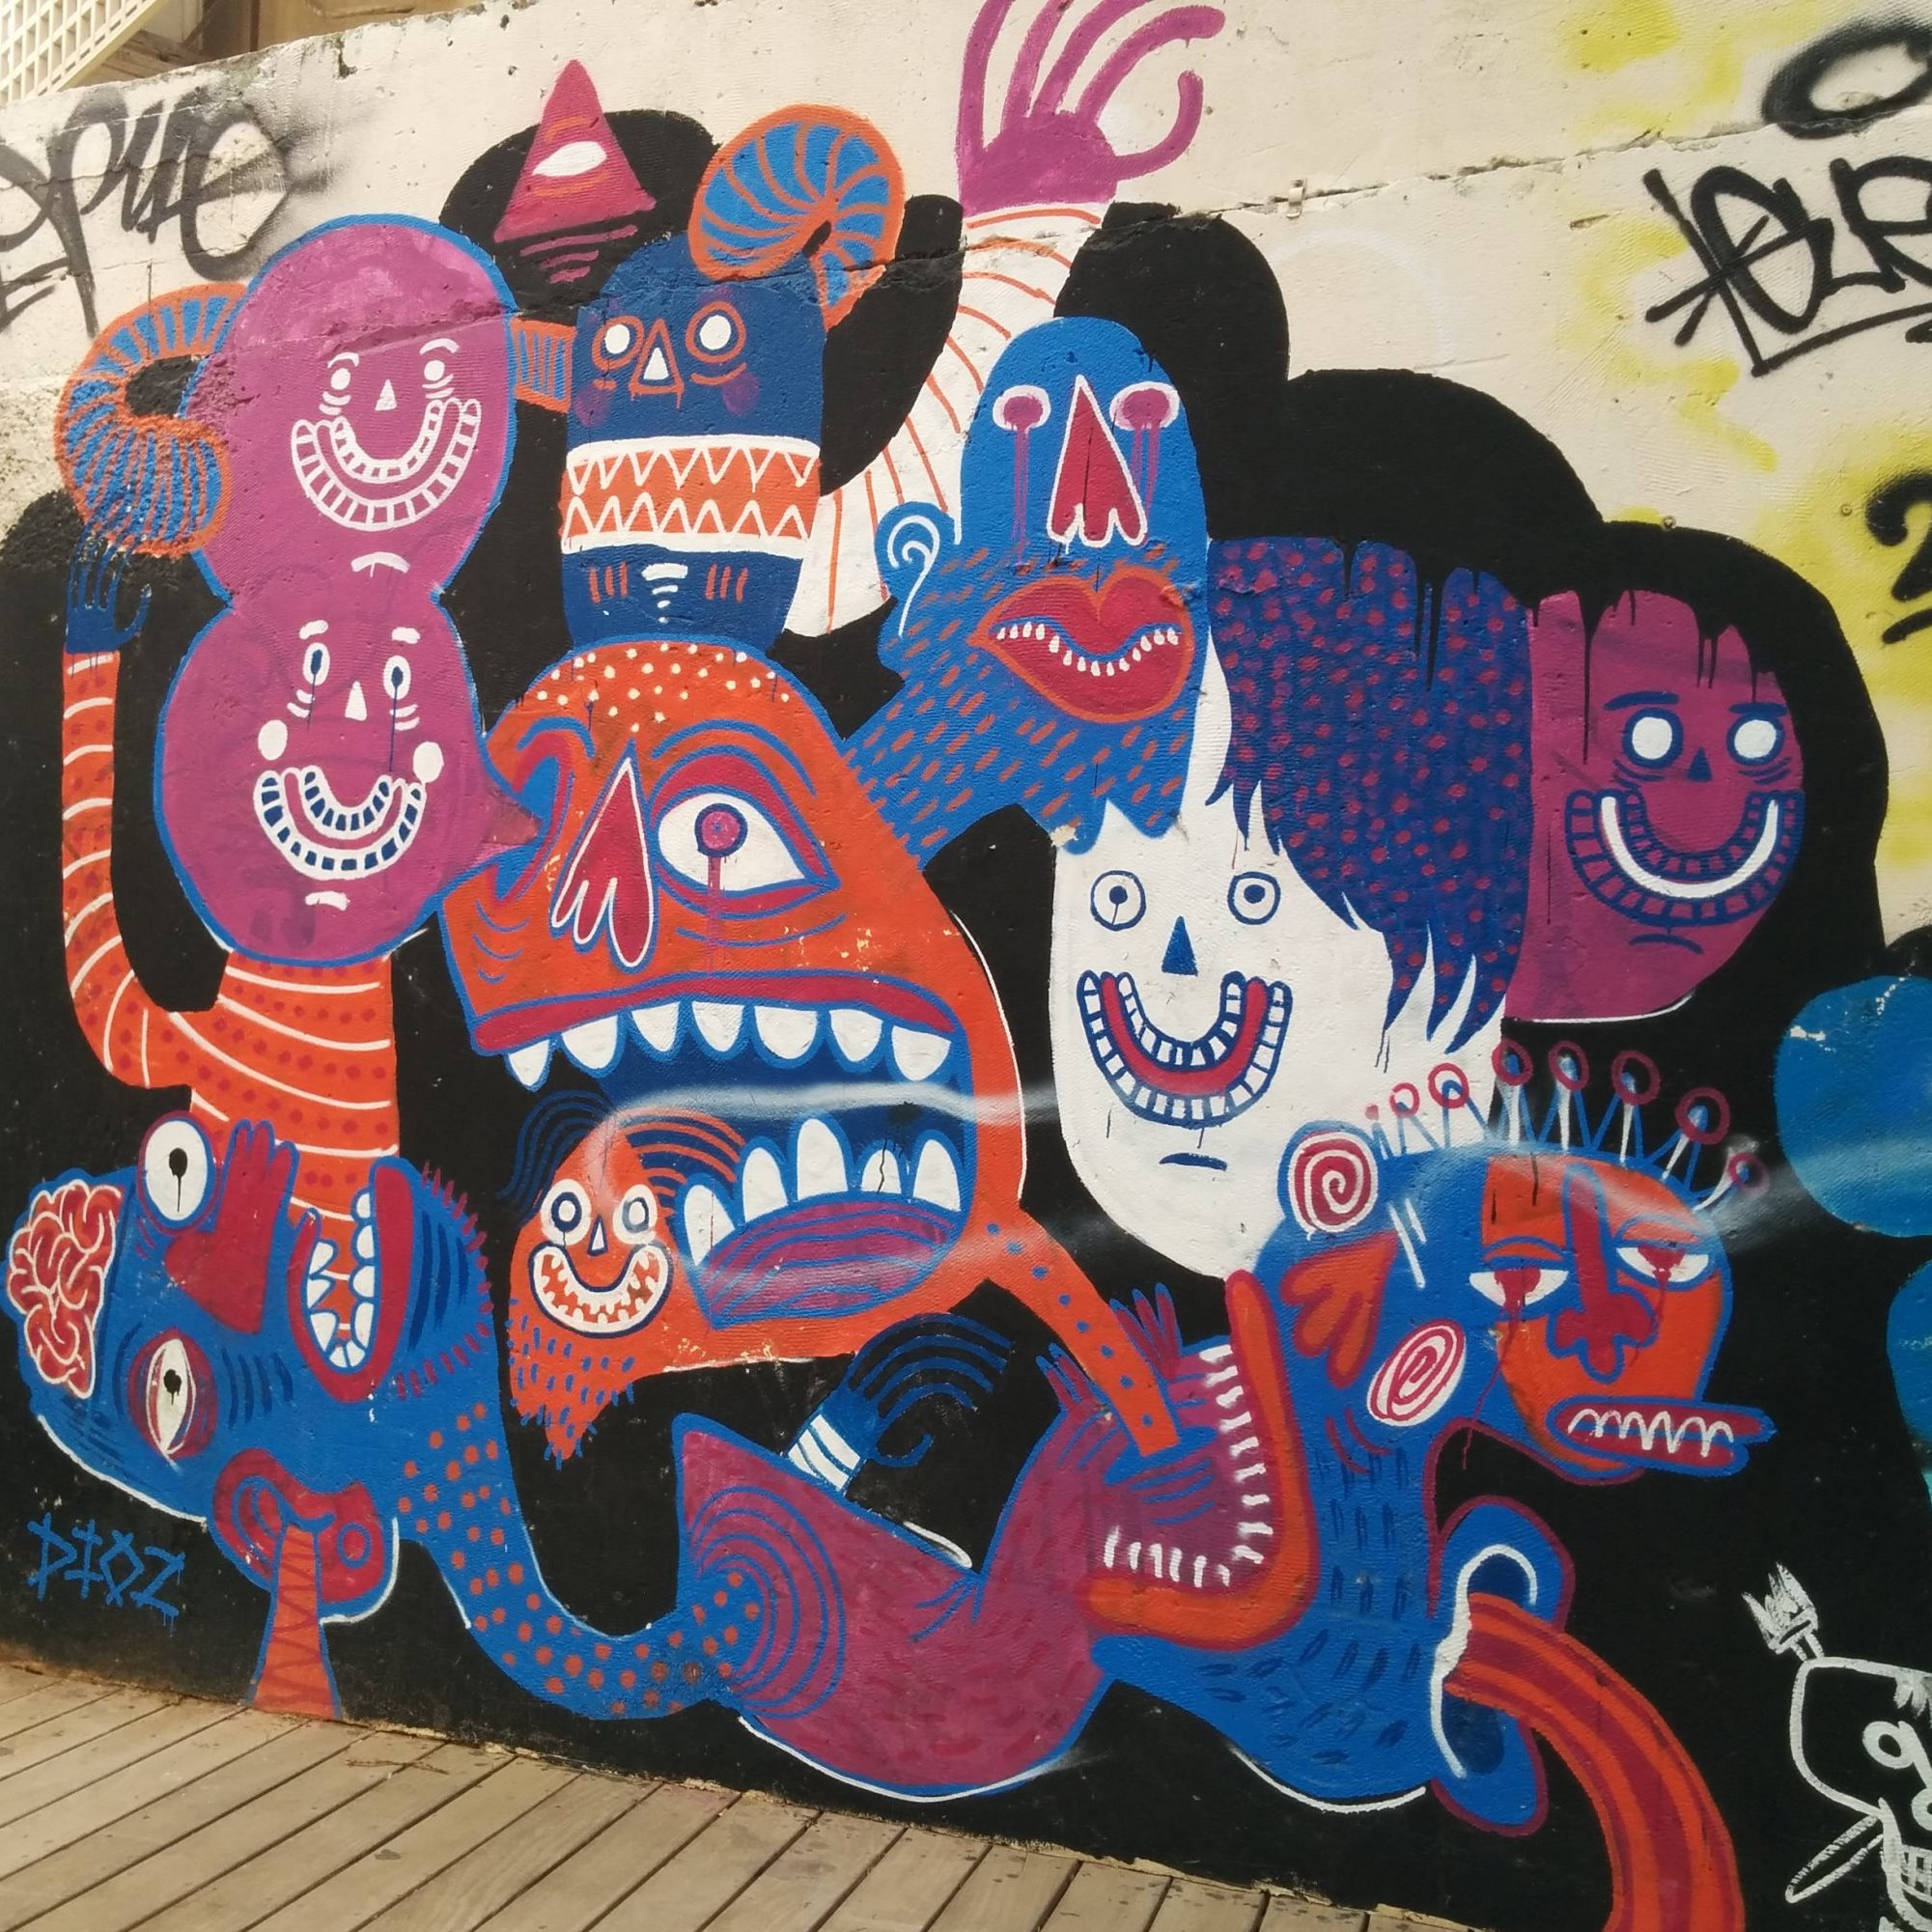 DIOZ's bold murals cover entire walls of Tel Aviv's Florentin neighborhood. Photo by Abigail Klein Leichman